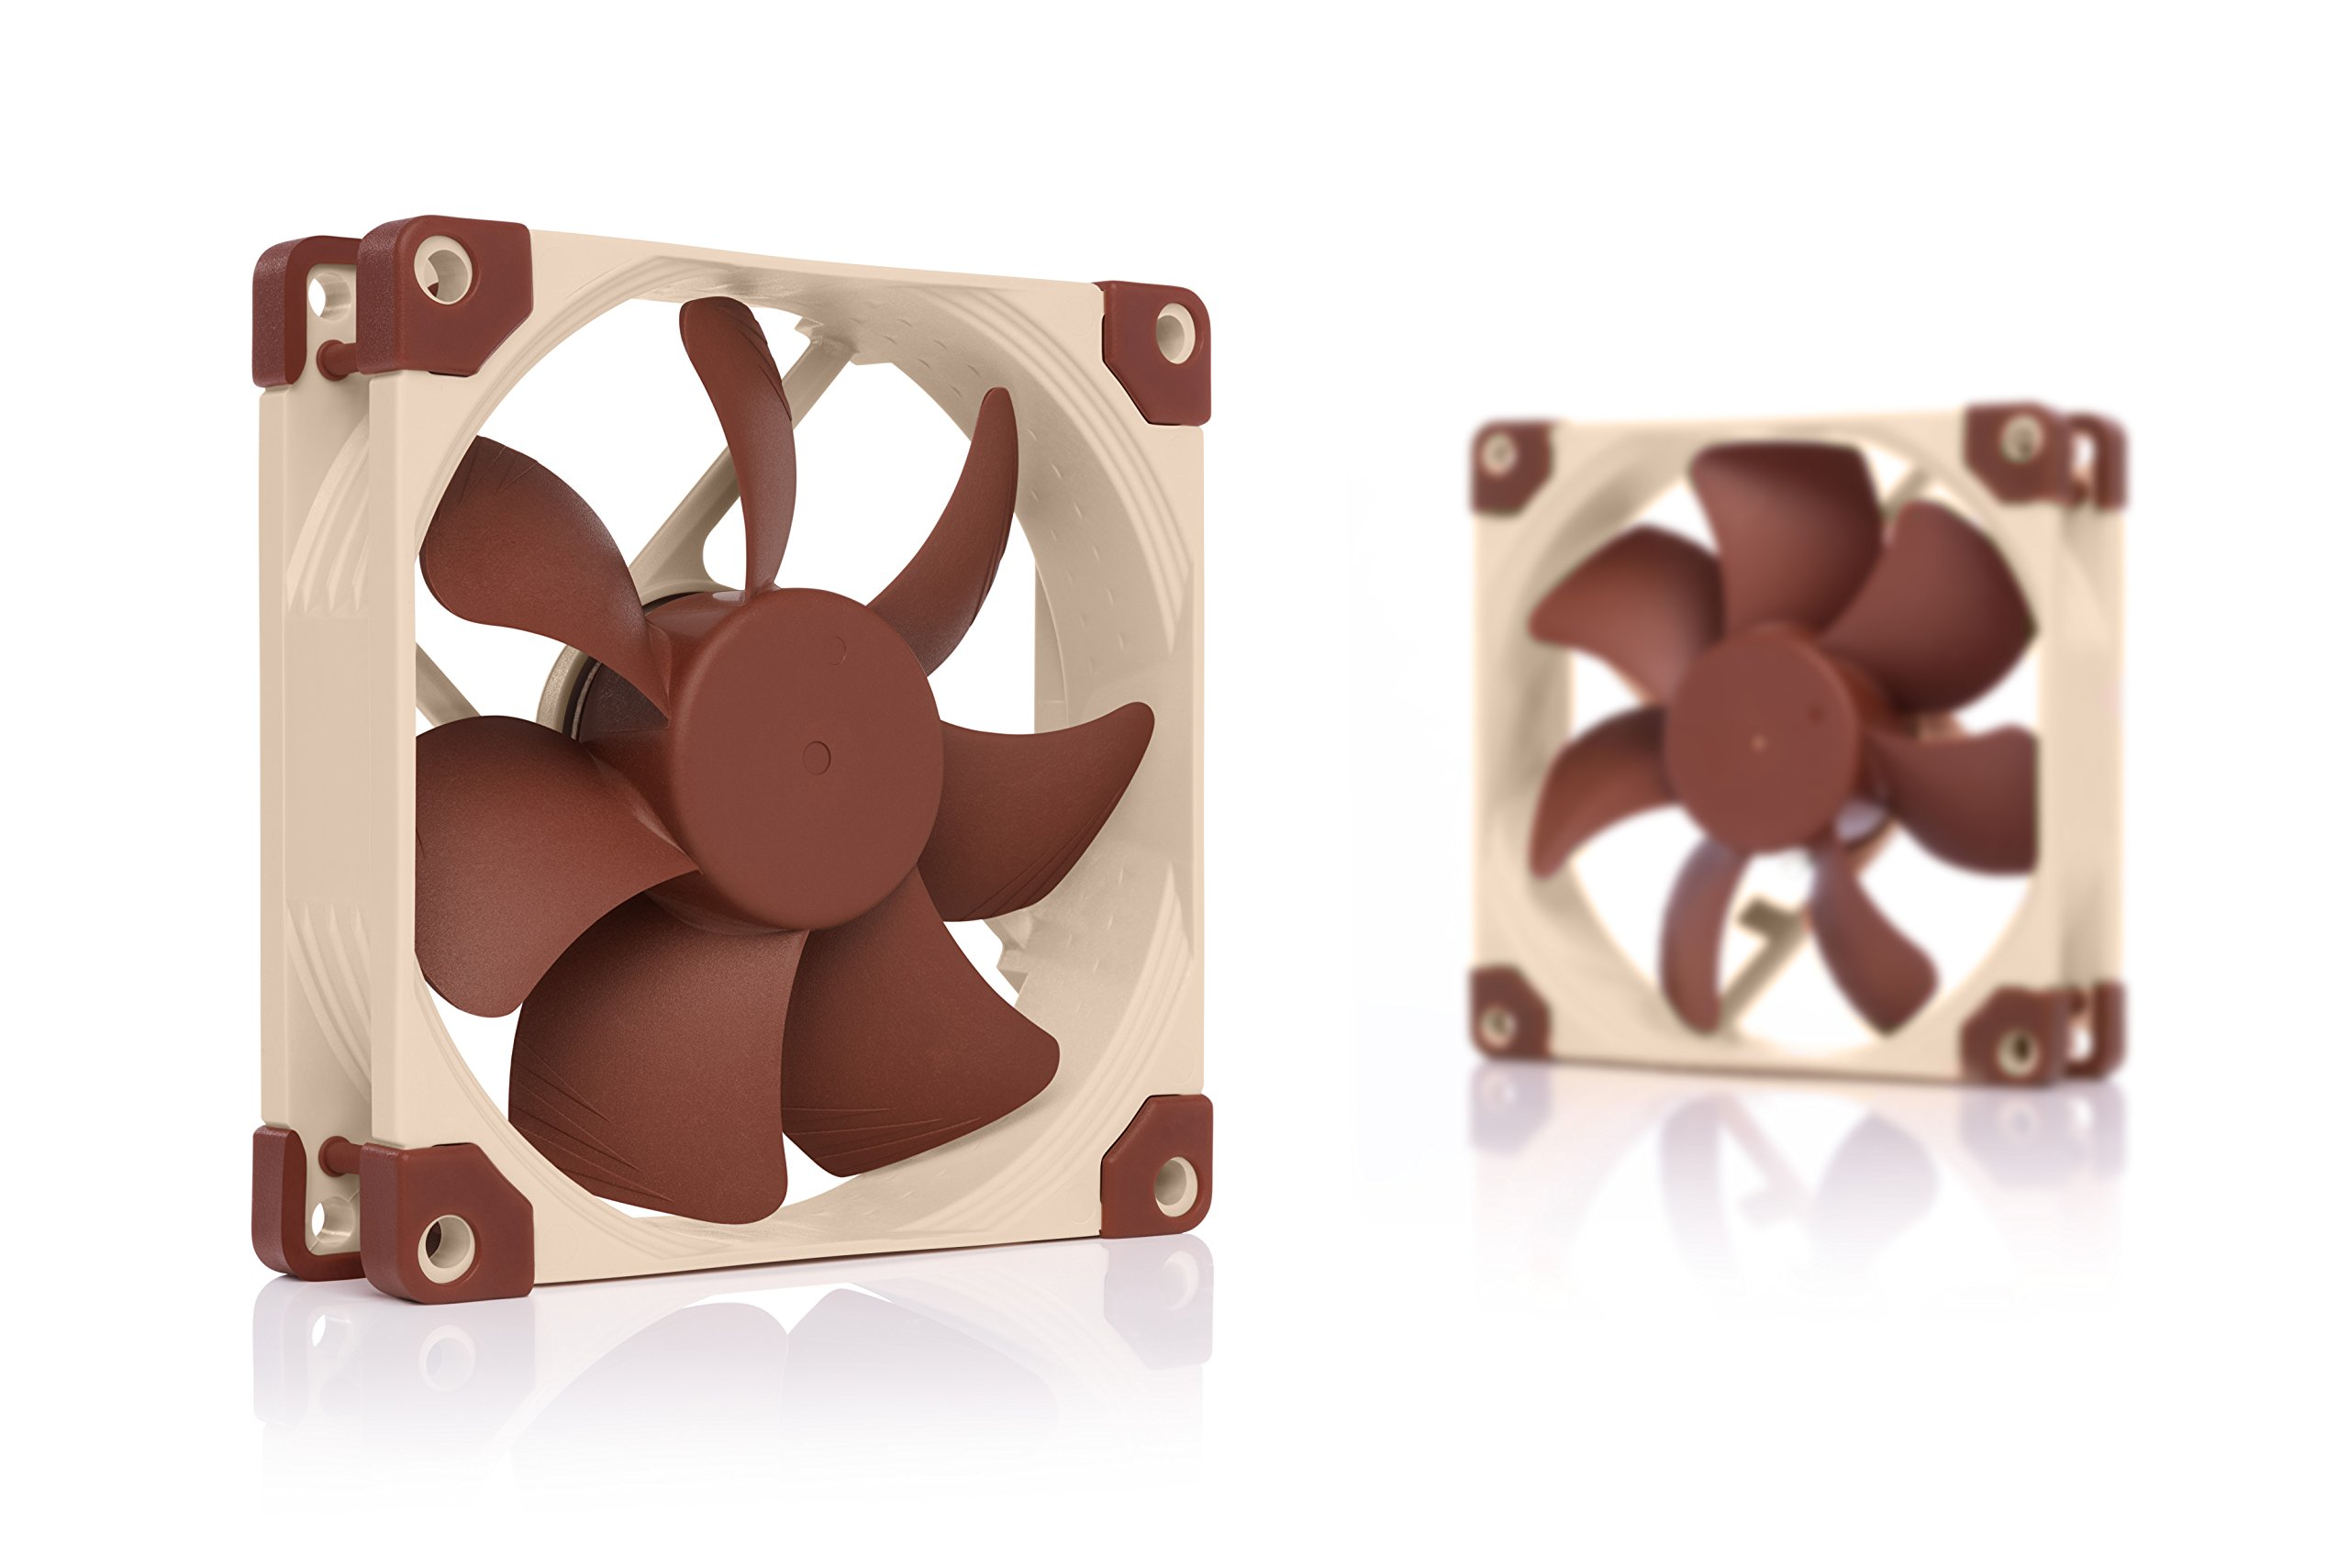 Noctua AAO Frame Design SSO2 Bearing Quiet Fan(NF-A9 PWM) by noctua (Image #7)